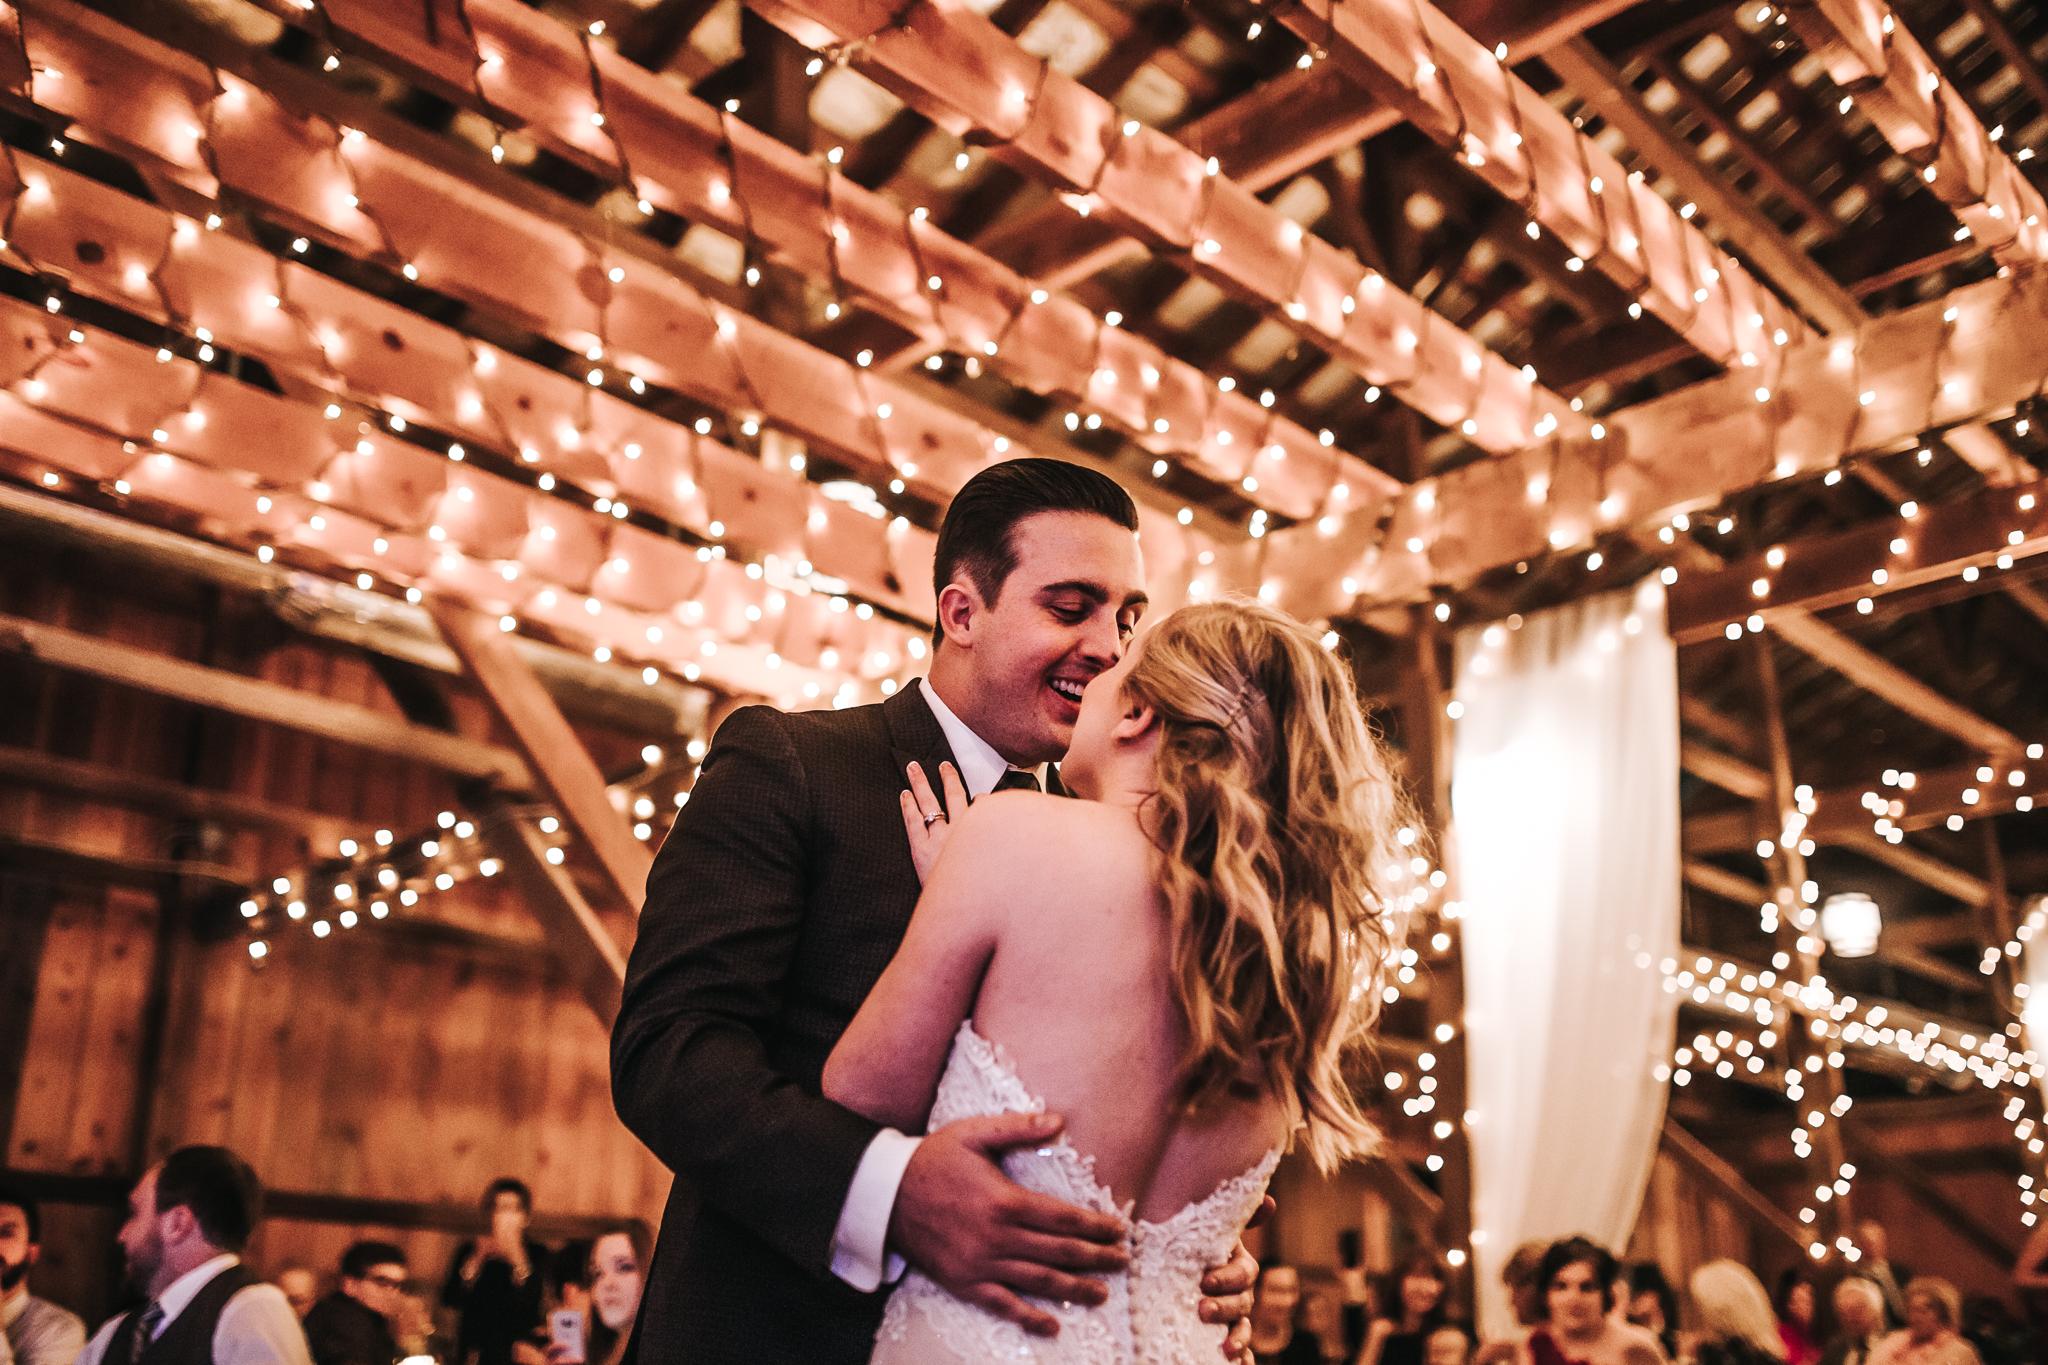 0165 Ariana Jordan Photo - Cameron & Lauren's Wedding at Talon Winery  7644.jpg